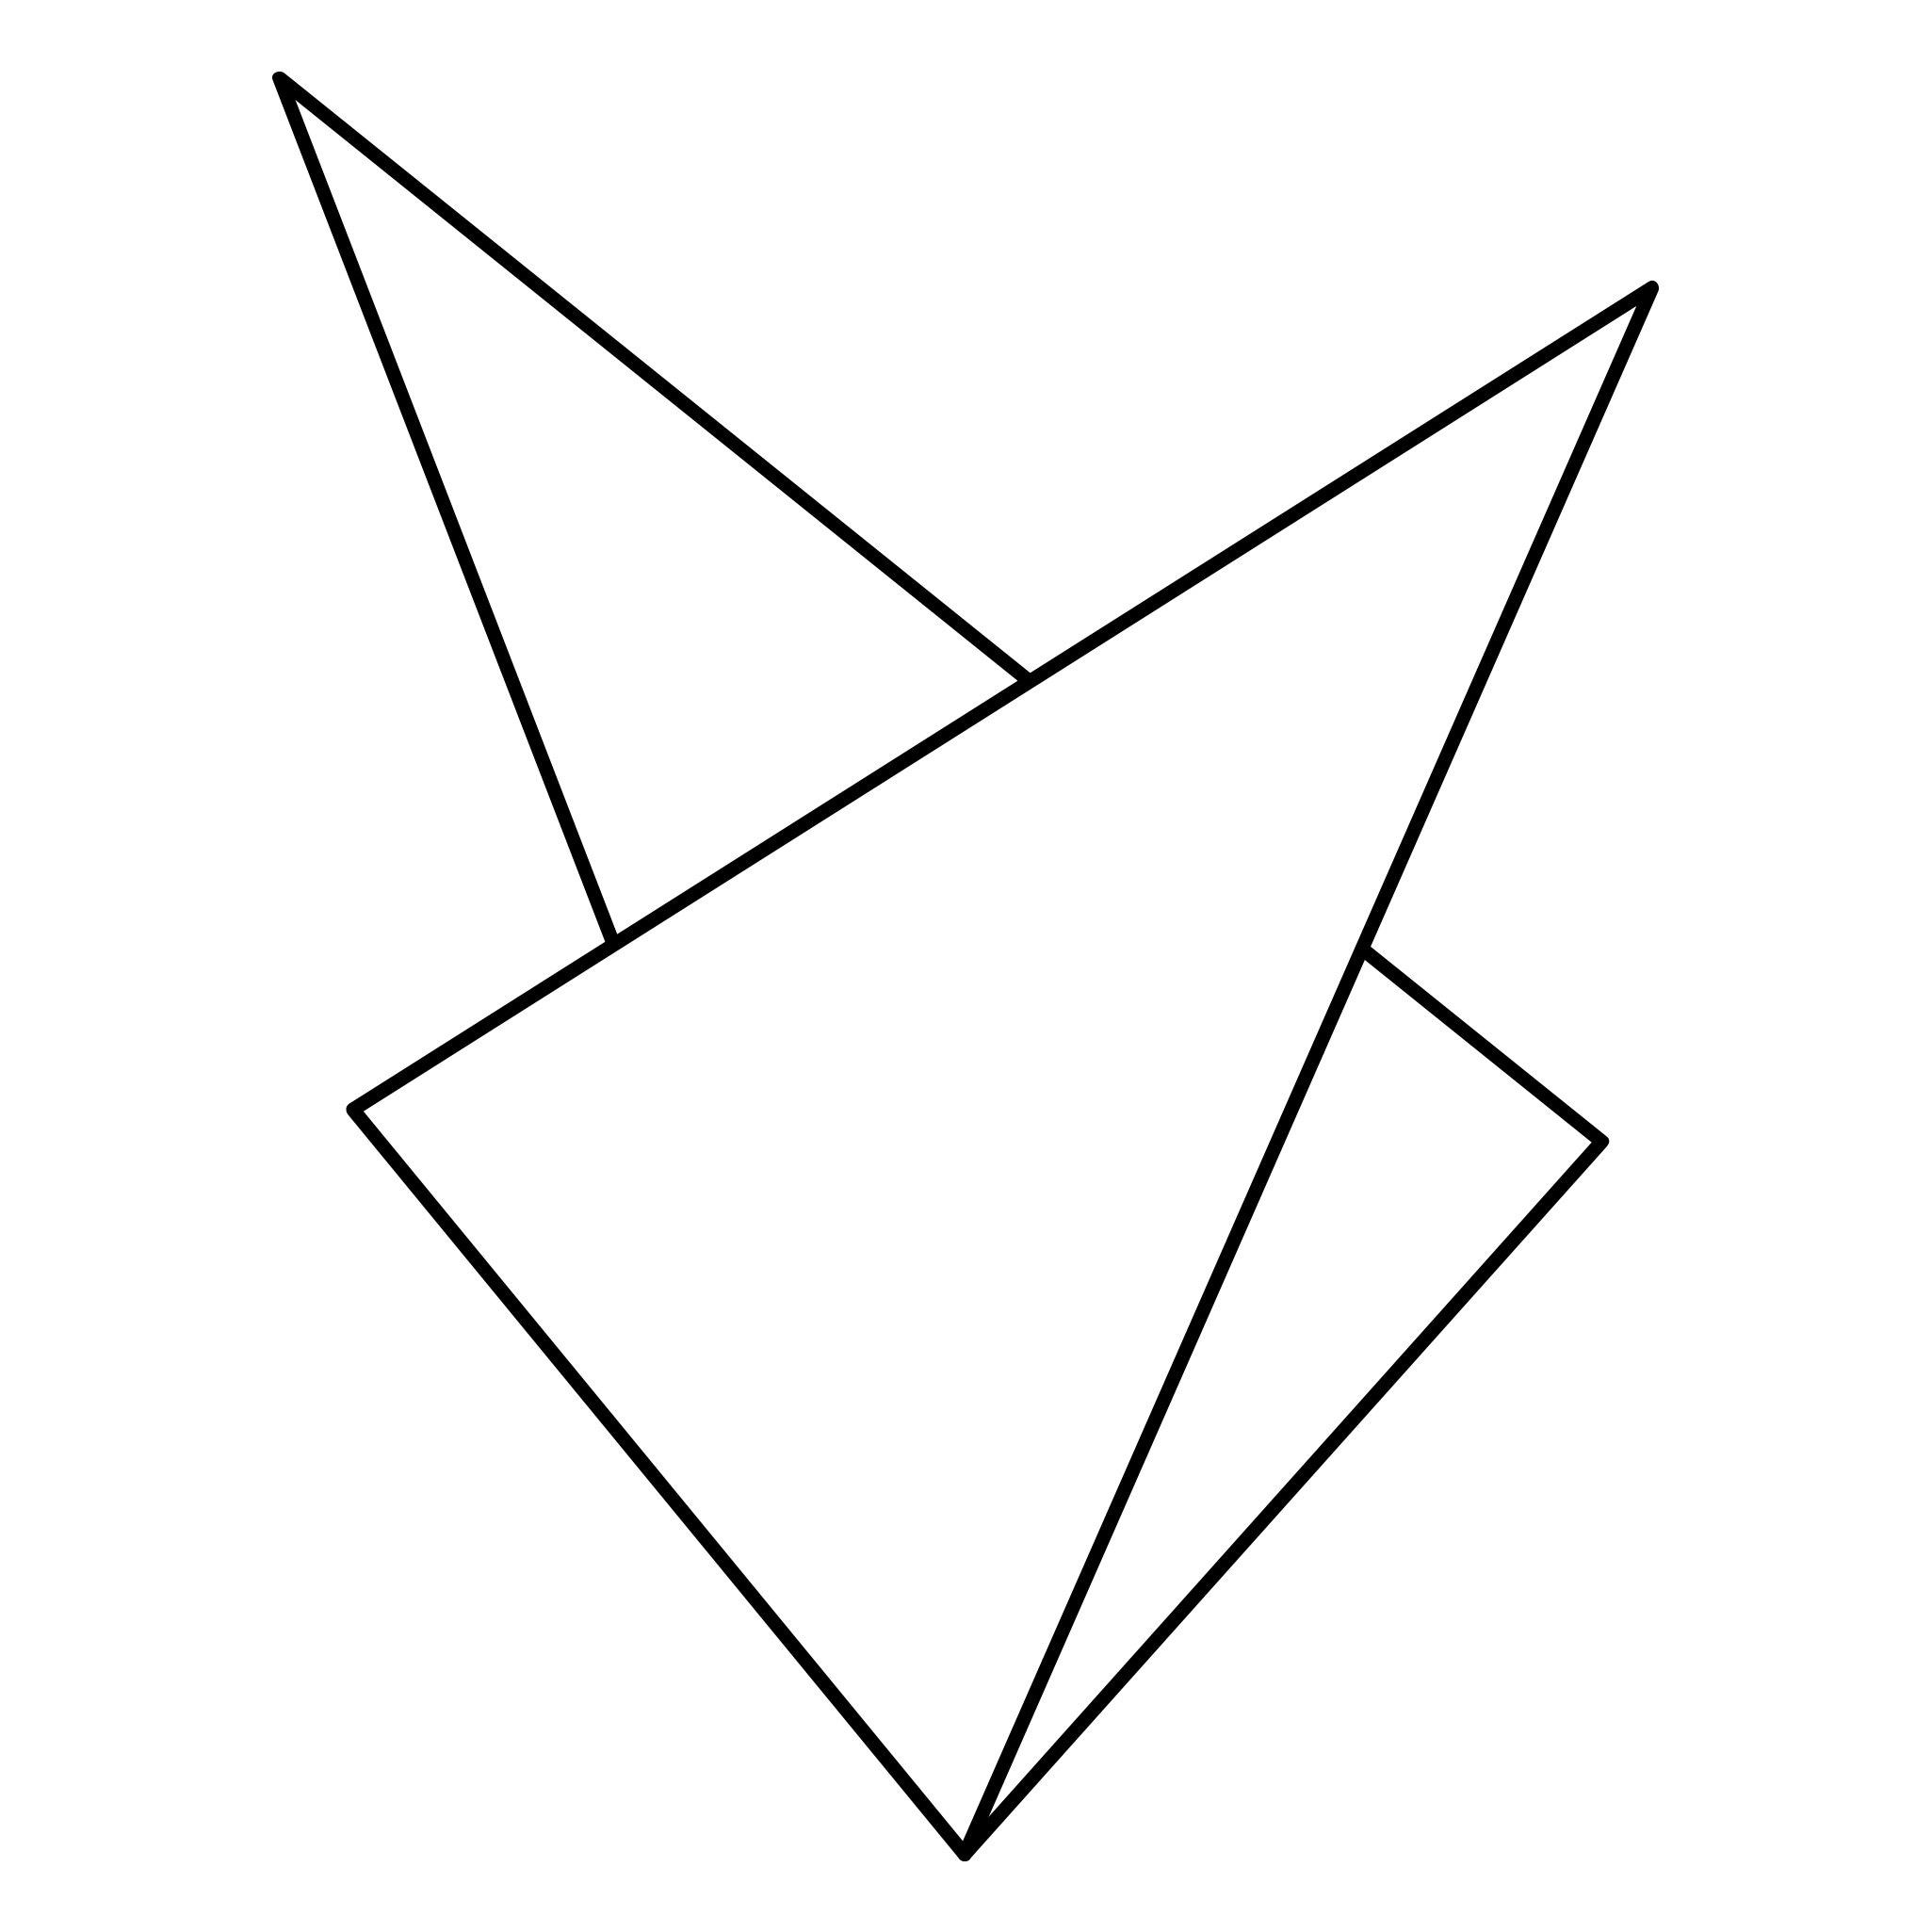 Hello i\'m Faltblatt and I love folding paper by Faltblatt on Etsy